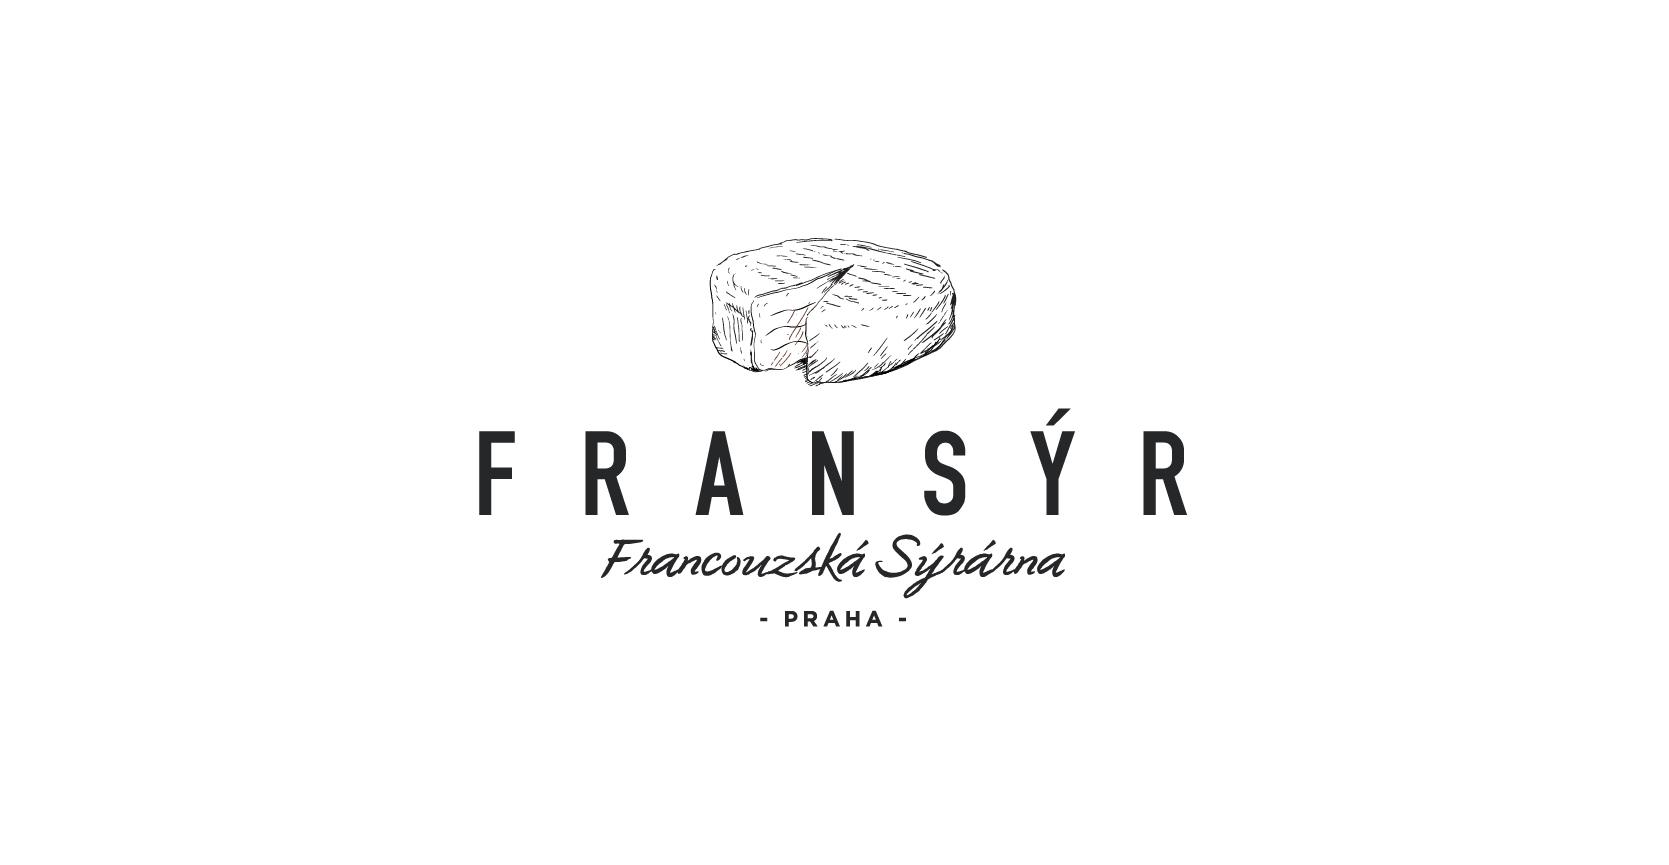 fransyr